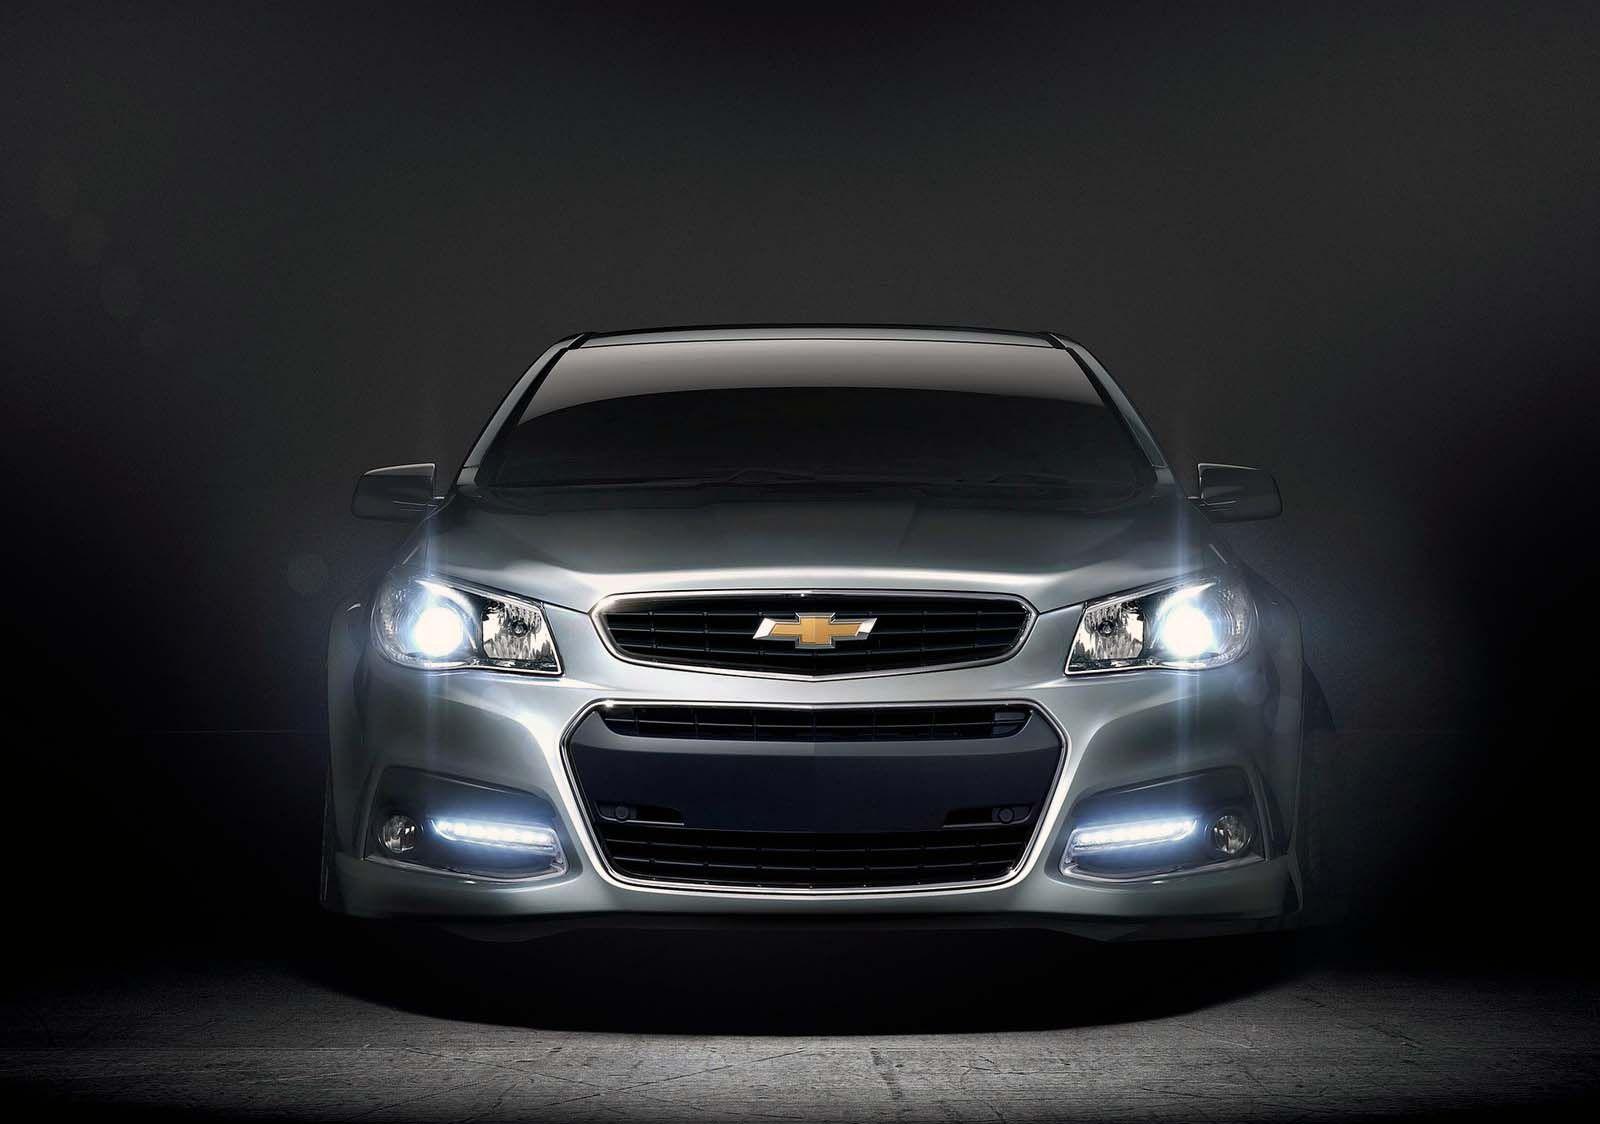 Nice 2014 Chevrolet Ss Wallpapers Chevrolet Gmc Pinterest